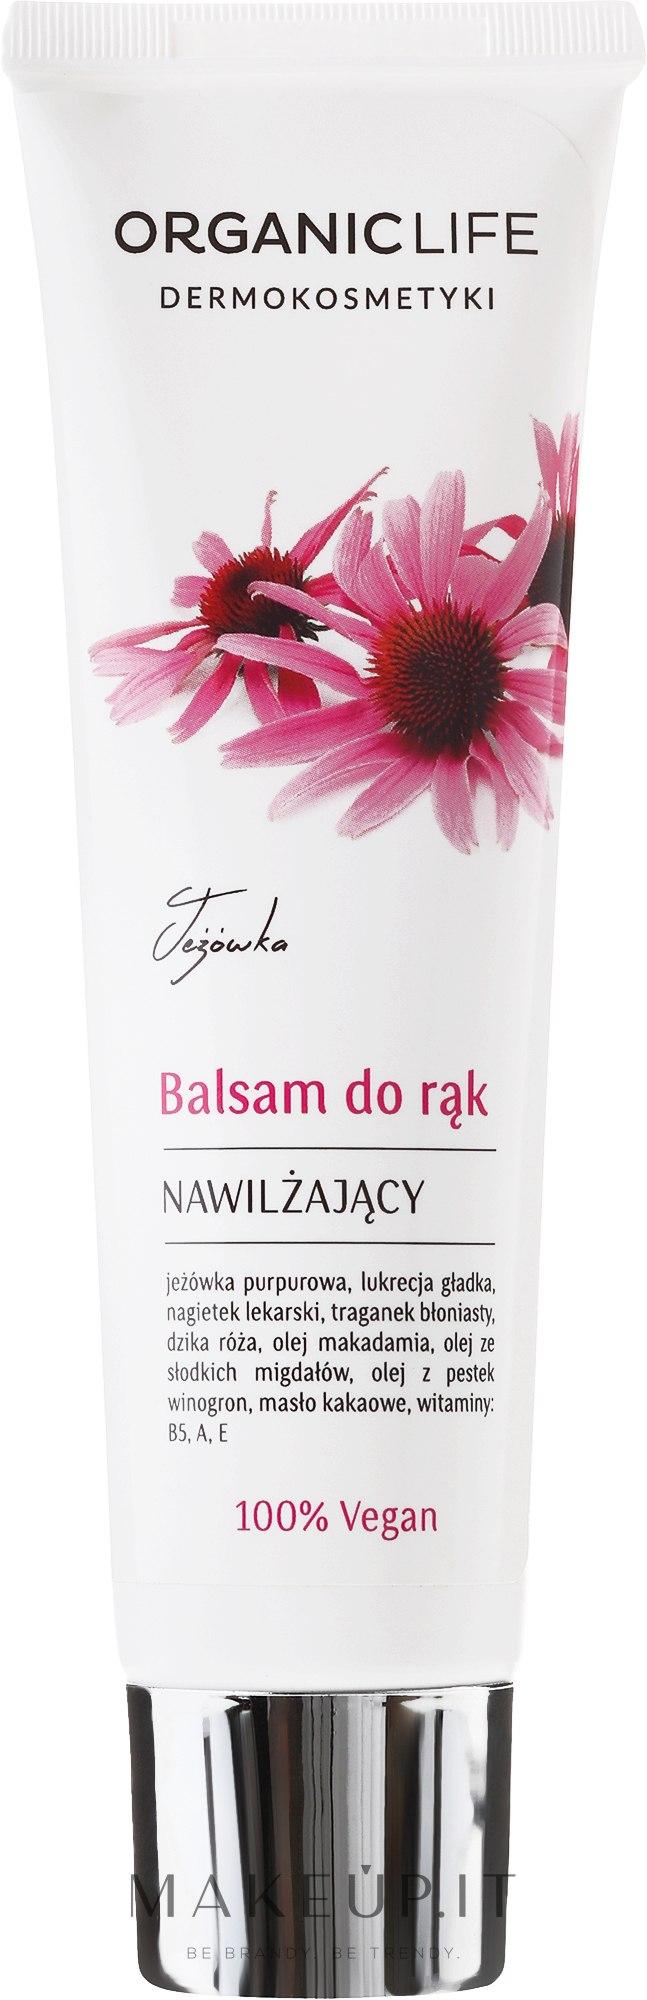 Balsamo mani idratante - Organic Life Dermocosmetics Hand Lotion — foto 50 g